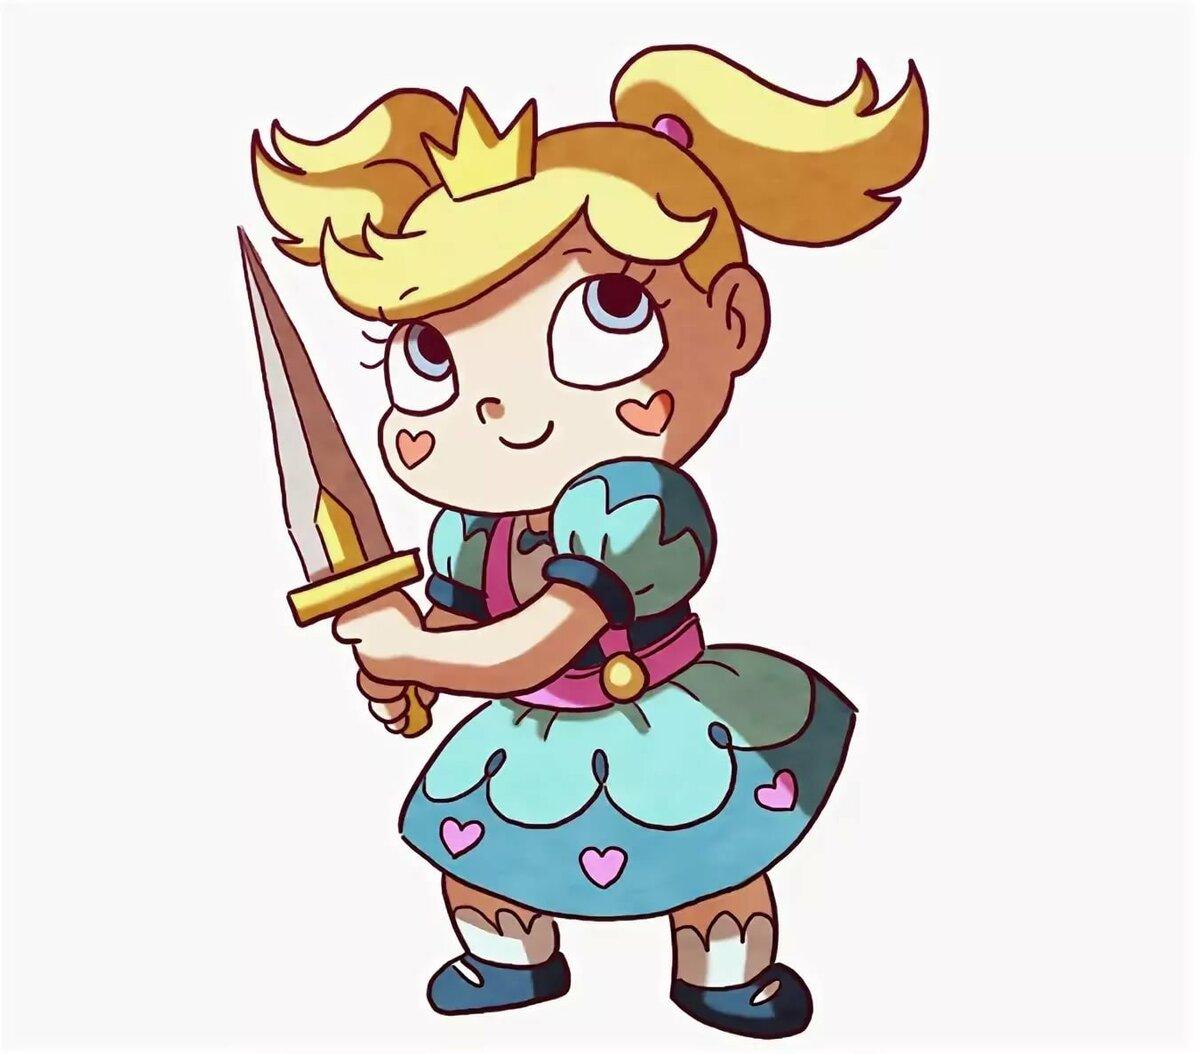 Звездная принцесса баттерфляй картинки